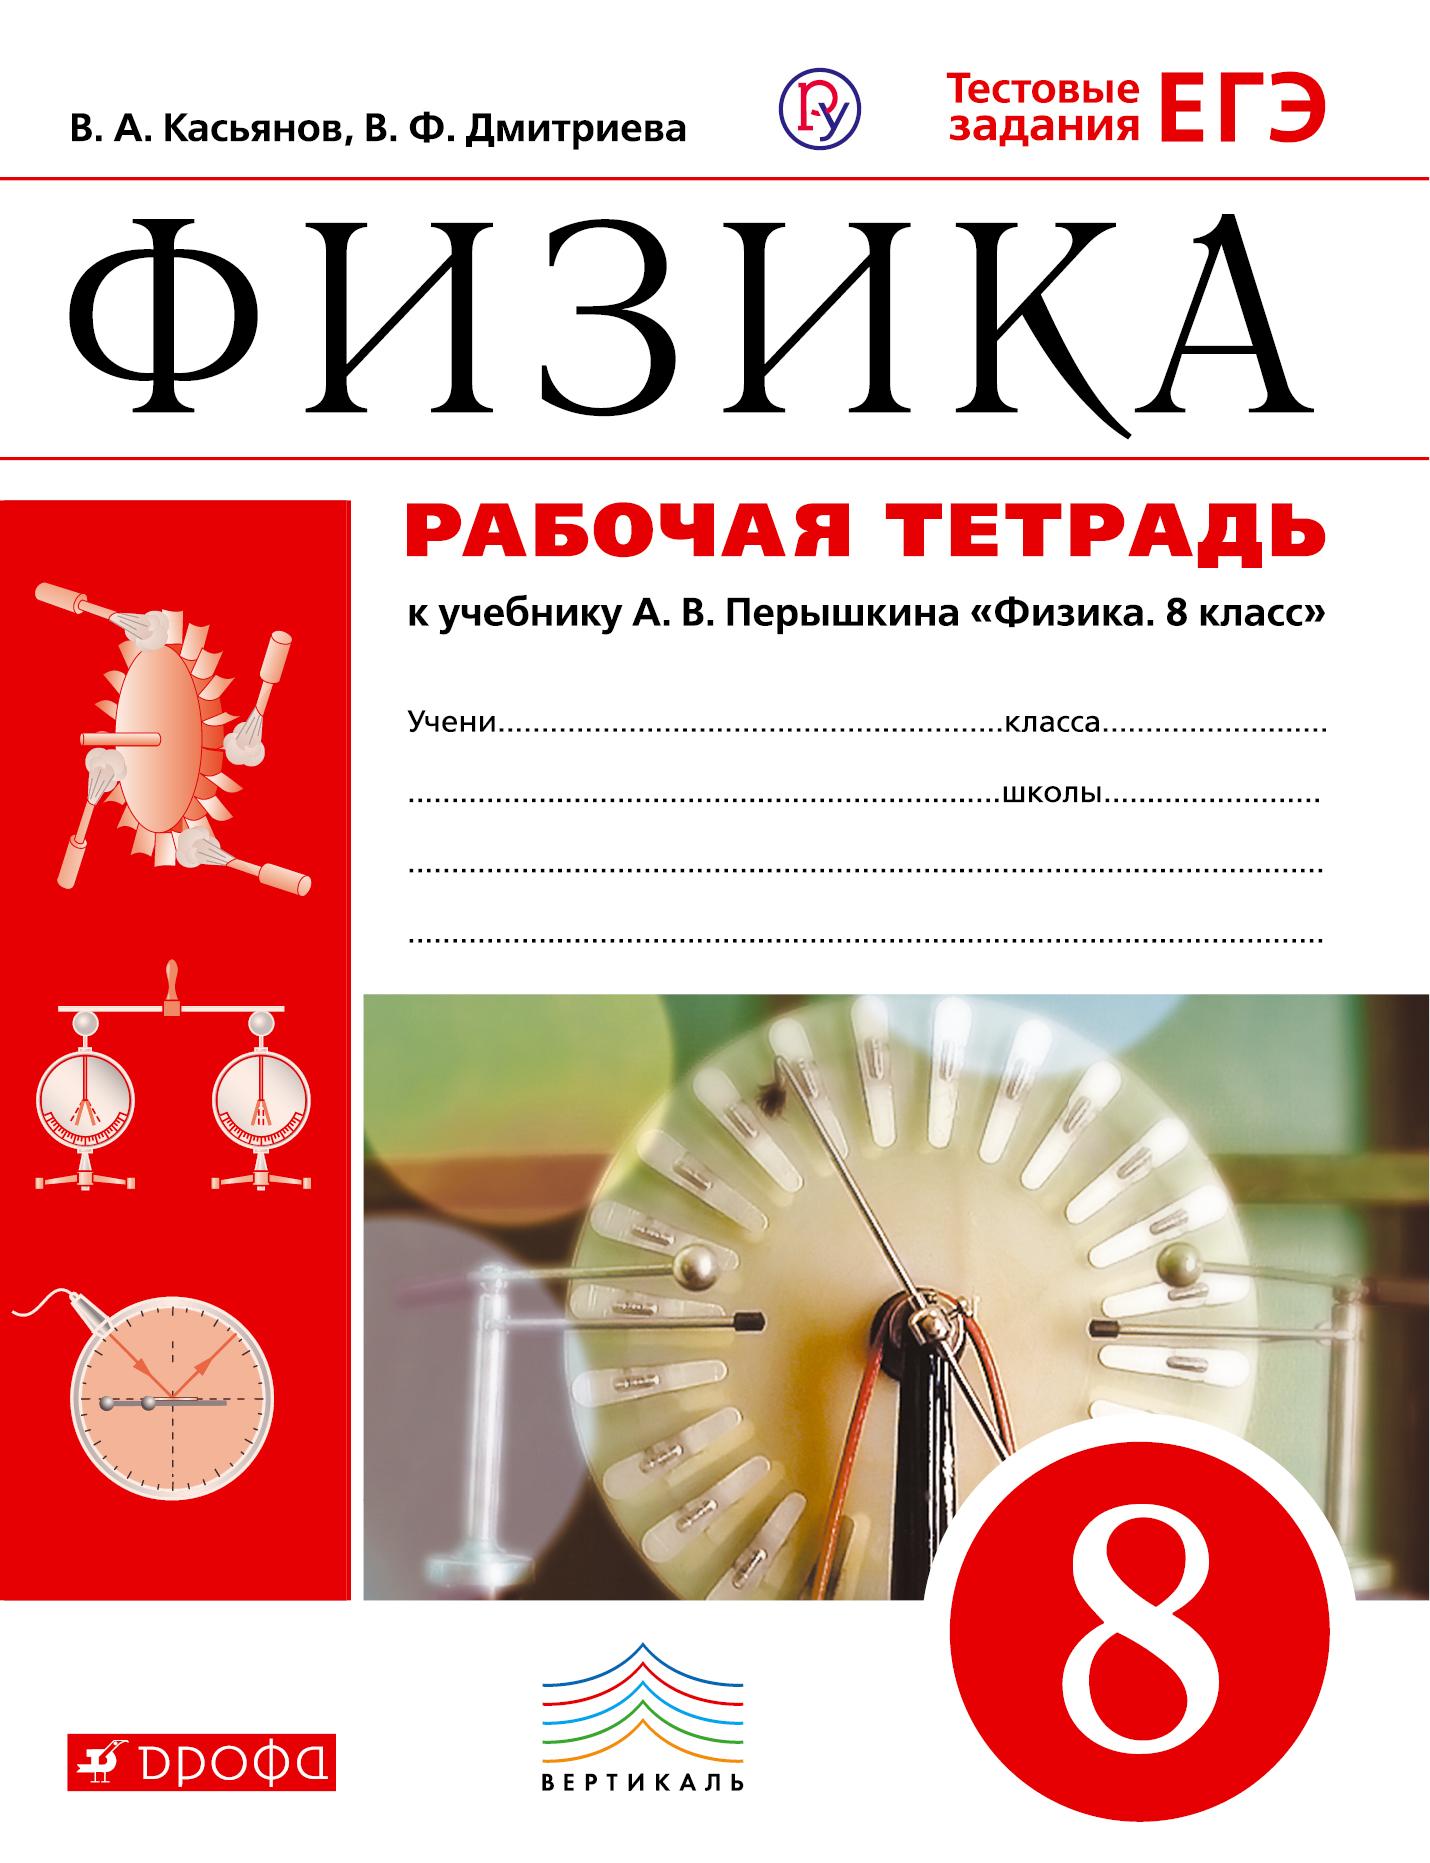 Касьянов В.А., Дмитриева В.Ф. Физика. 8 класс. Рабочая тетрадь. физика 8 класс тесты